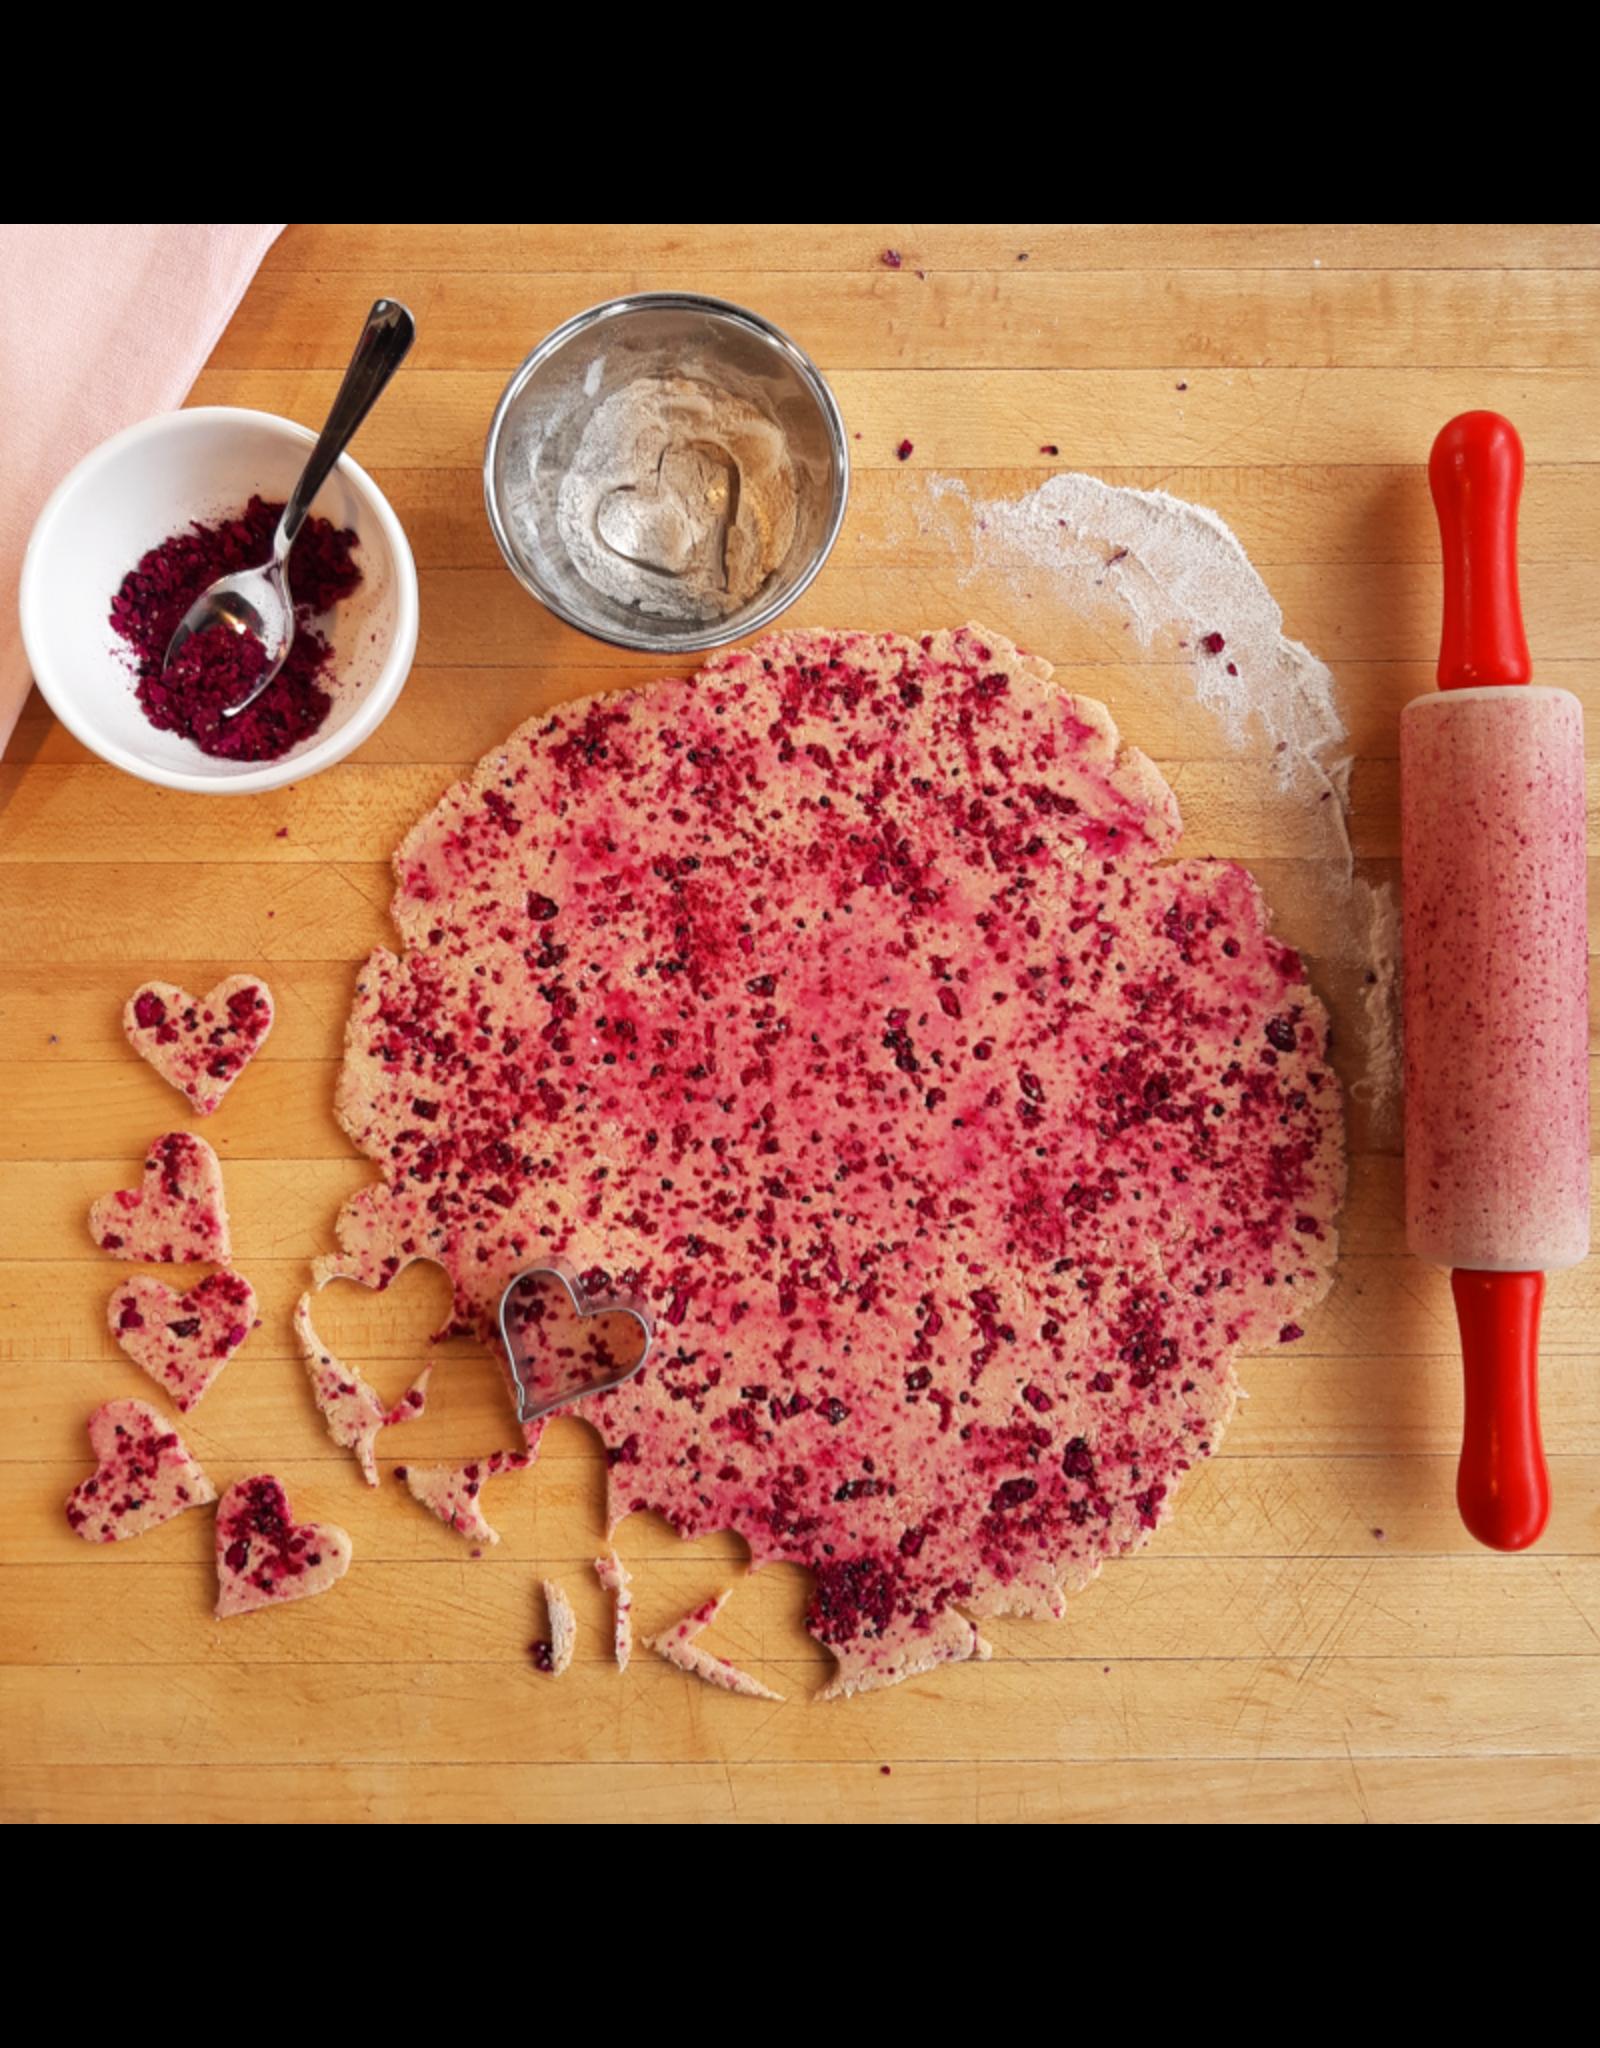 Cú Bakery Cúkies Dog Cookie Baking Kit 239g